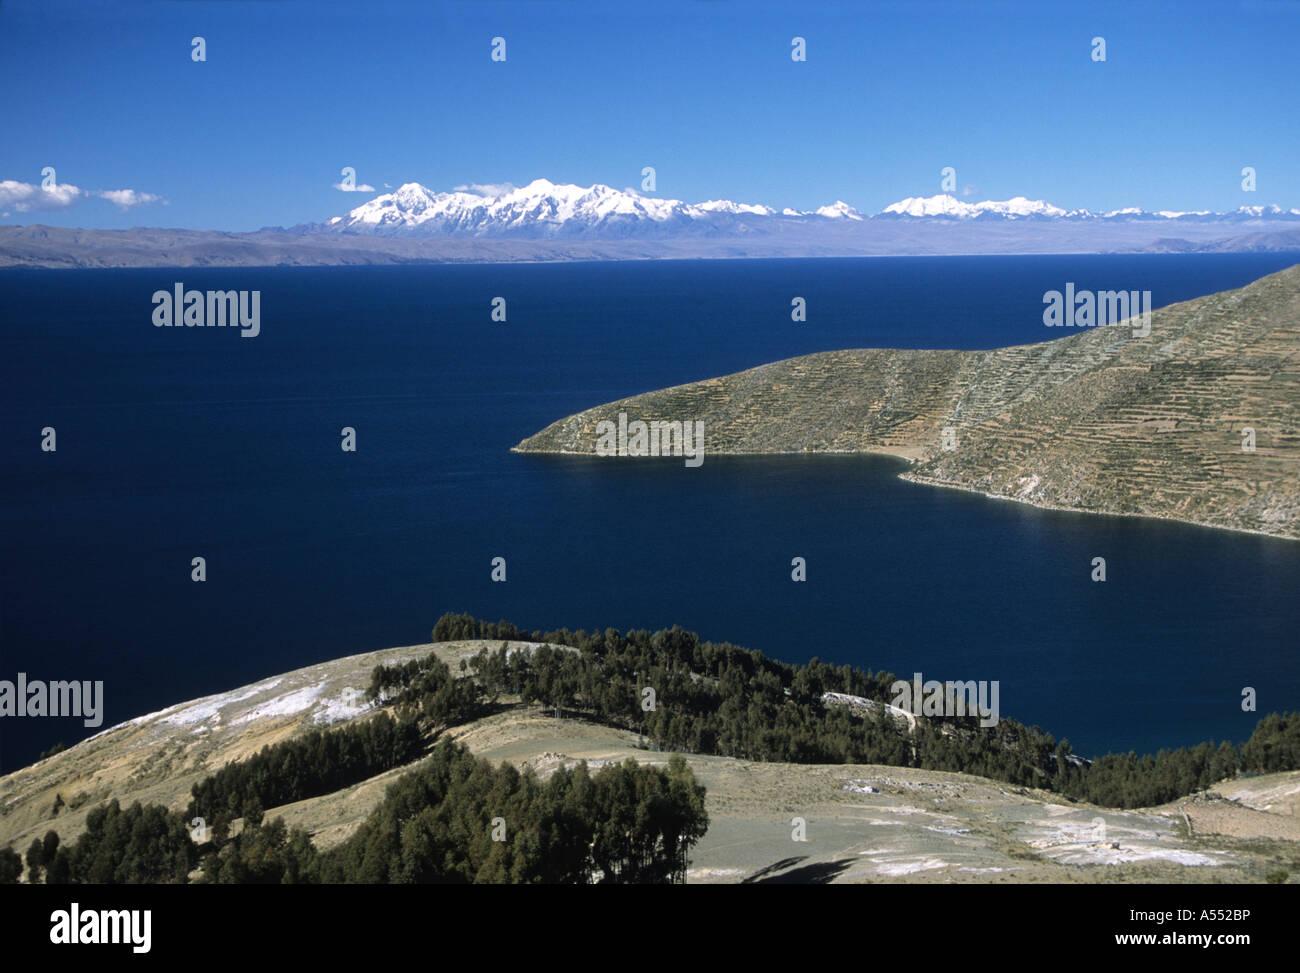 View towards Cordillera Real from Sun Island, Lake Titicaca, Bolivia - Stock Image